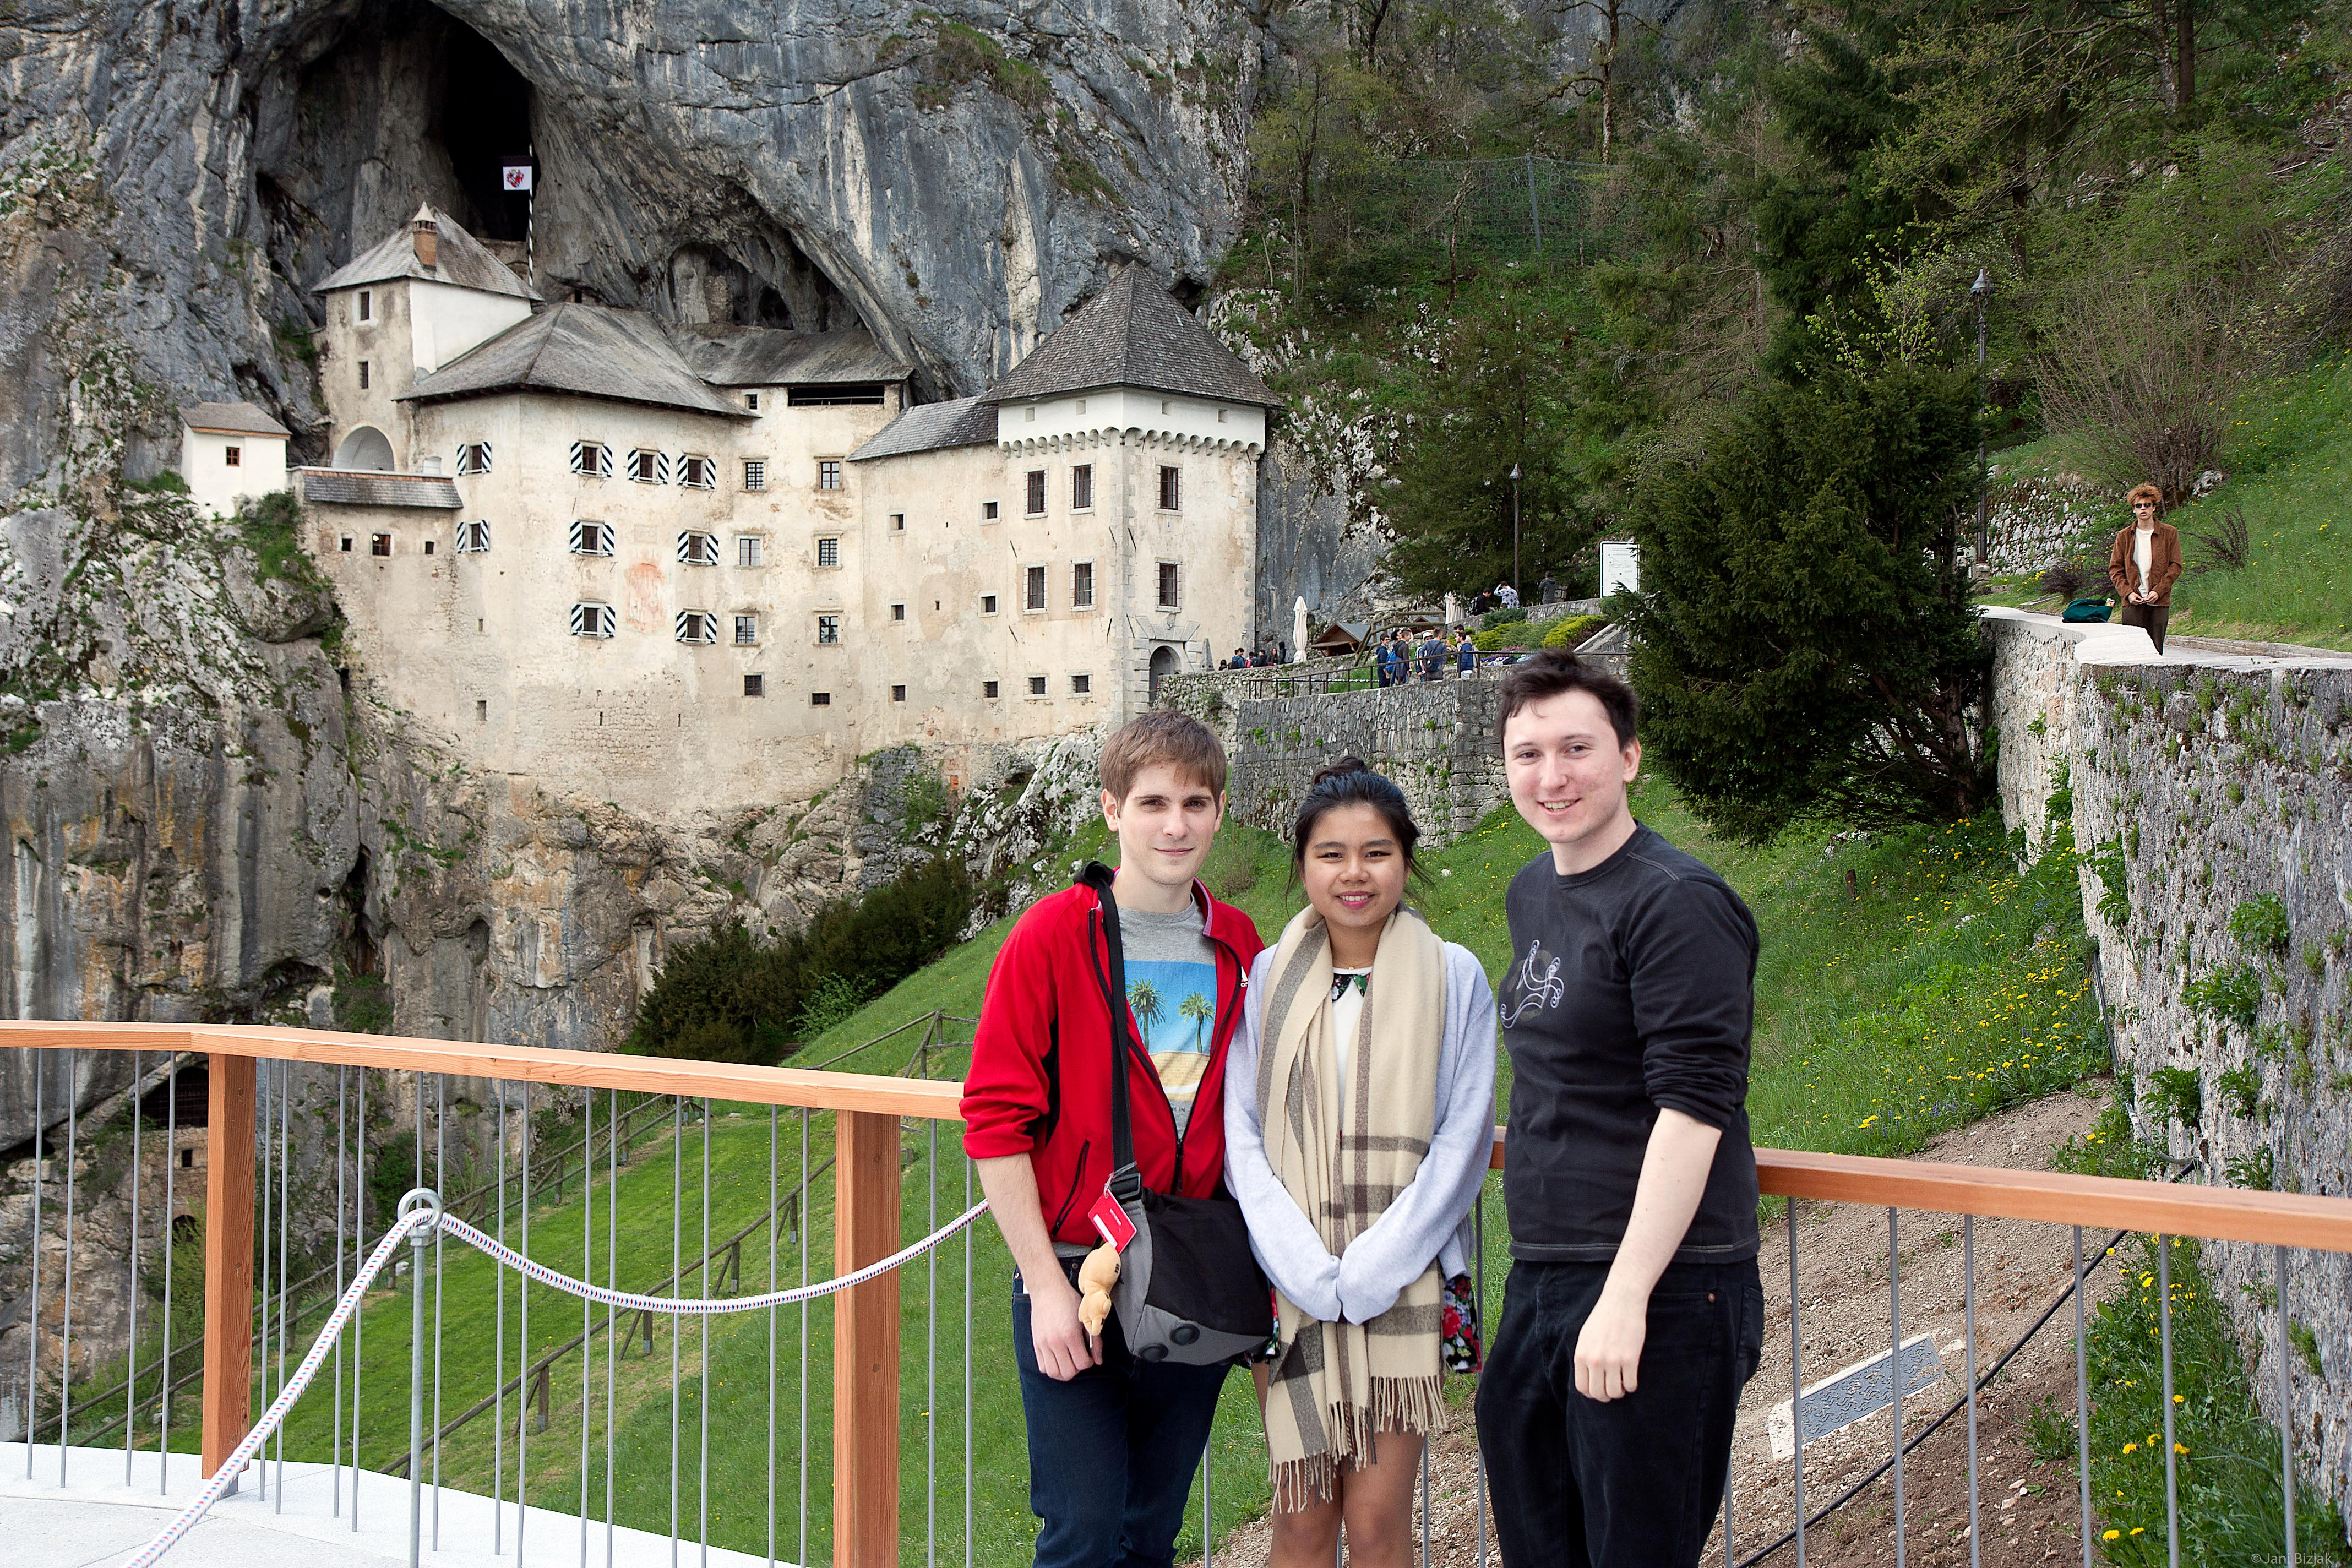 Jean, Maggie and me in front of Predjama castle.